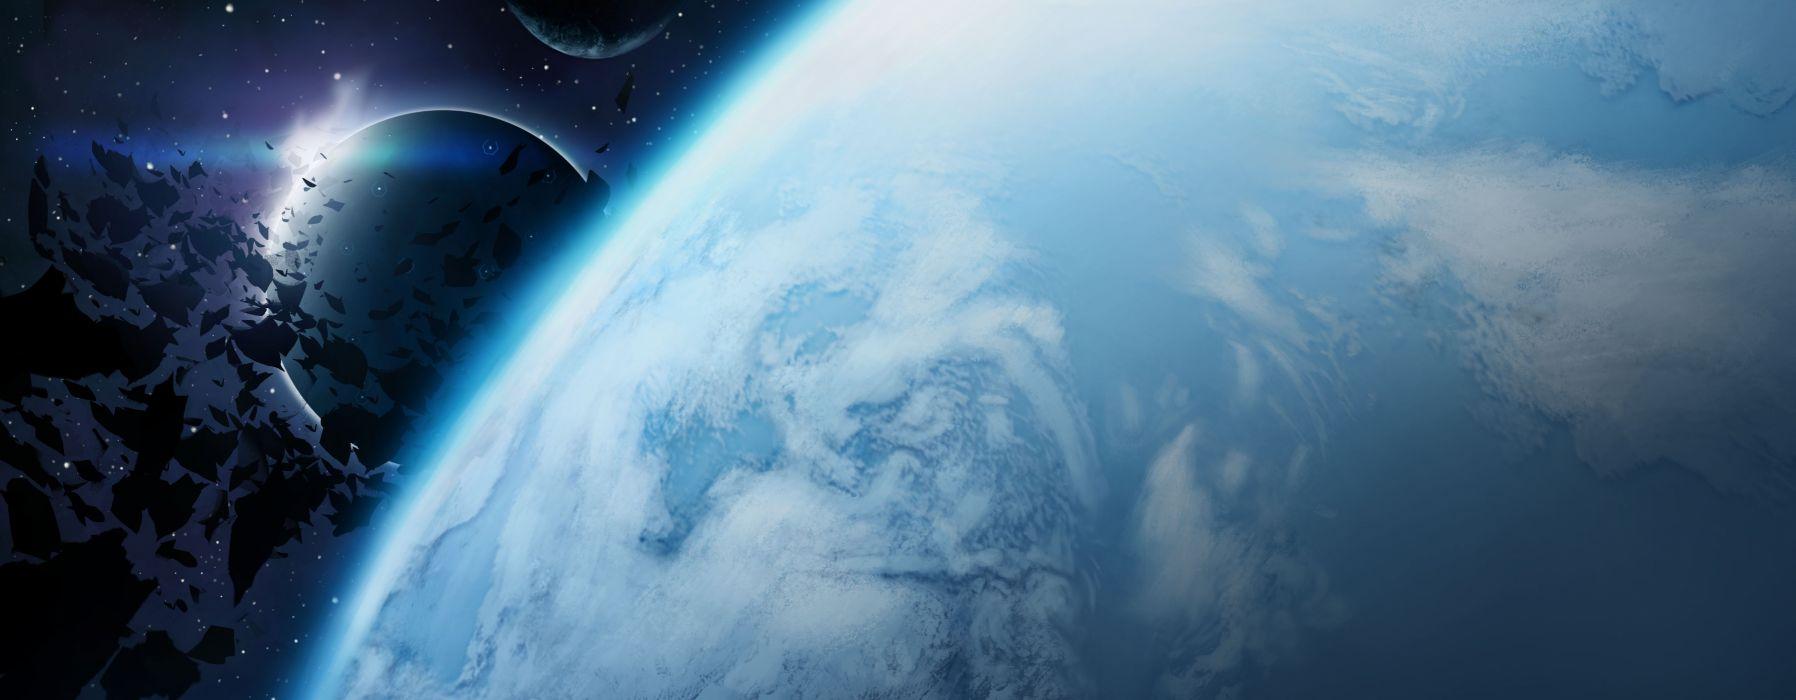 space art planet moons wallpaper